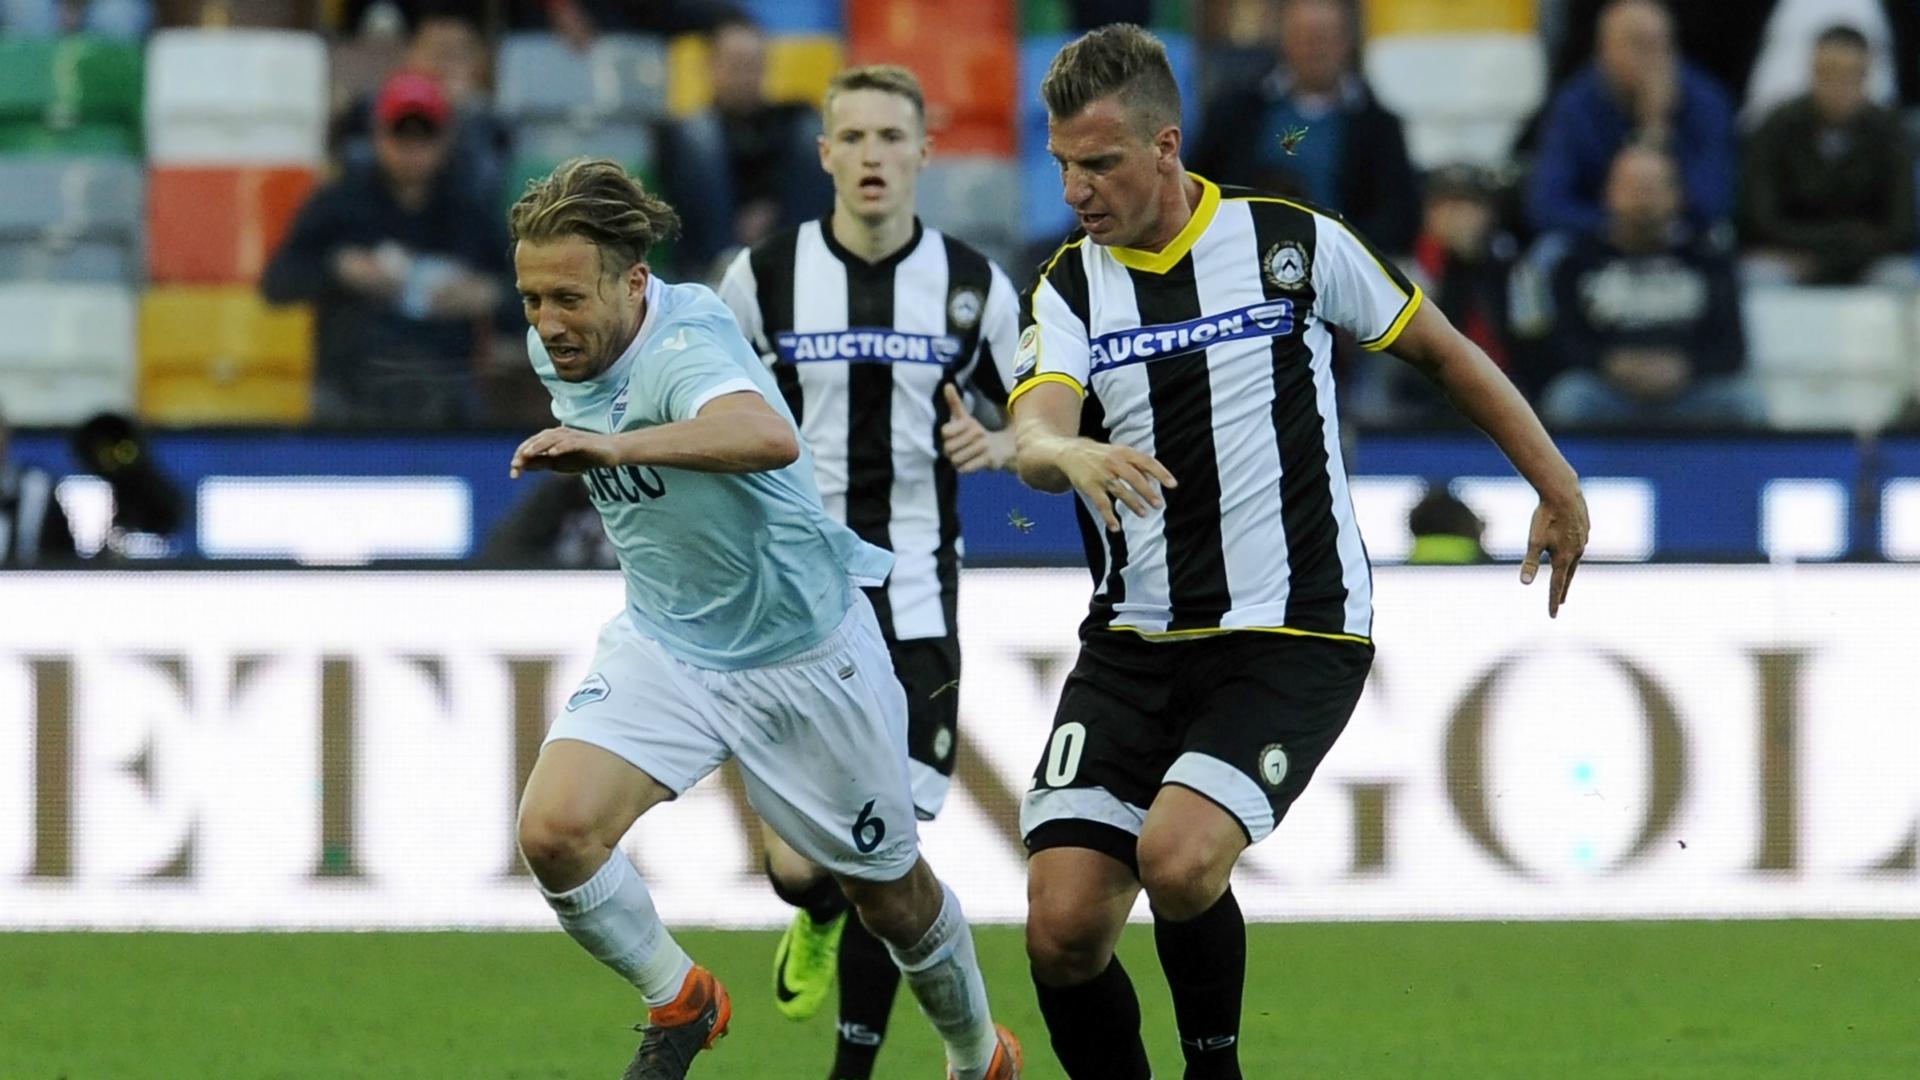 Lucas Leiva Maxi Lopez Udinese Lazio Serie A 04082018